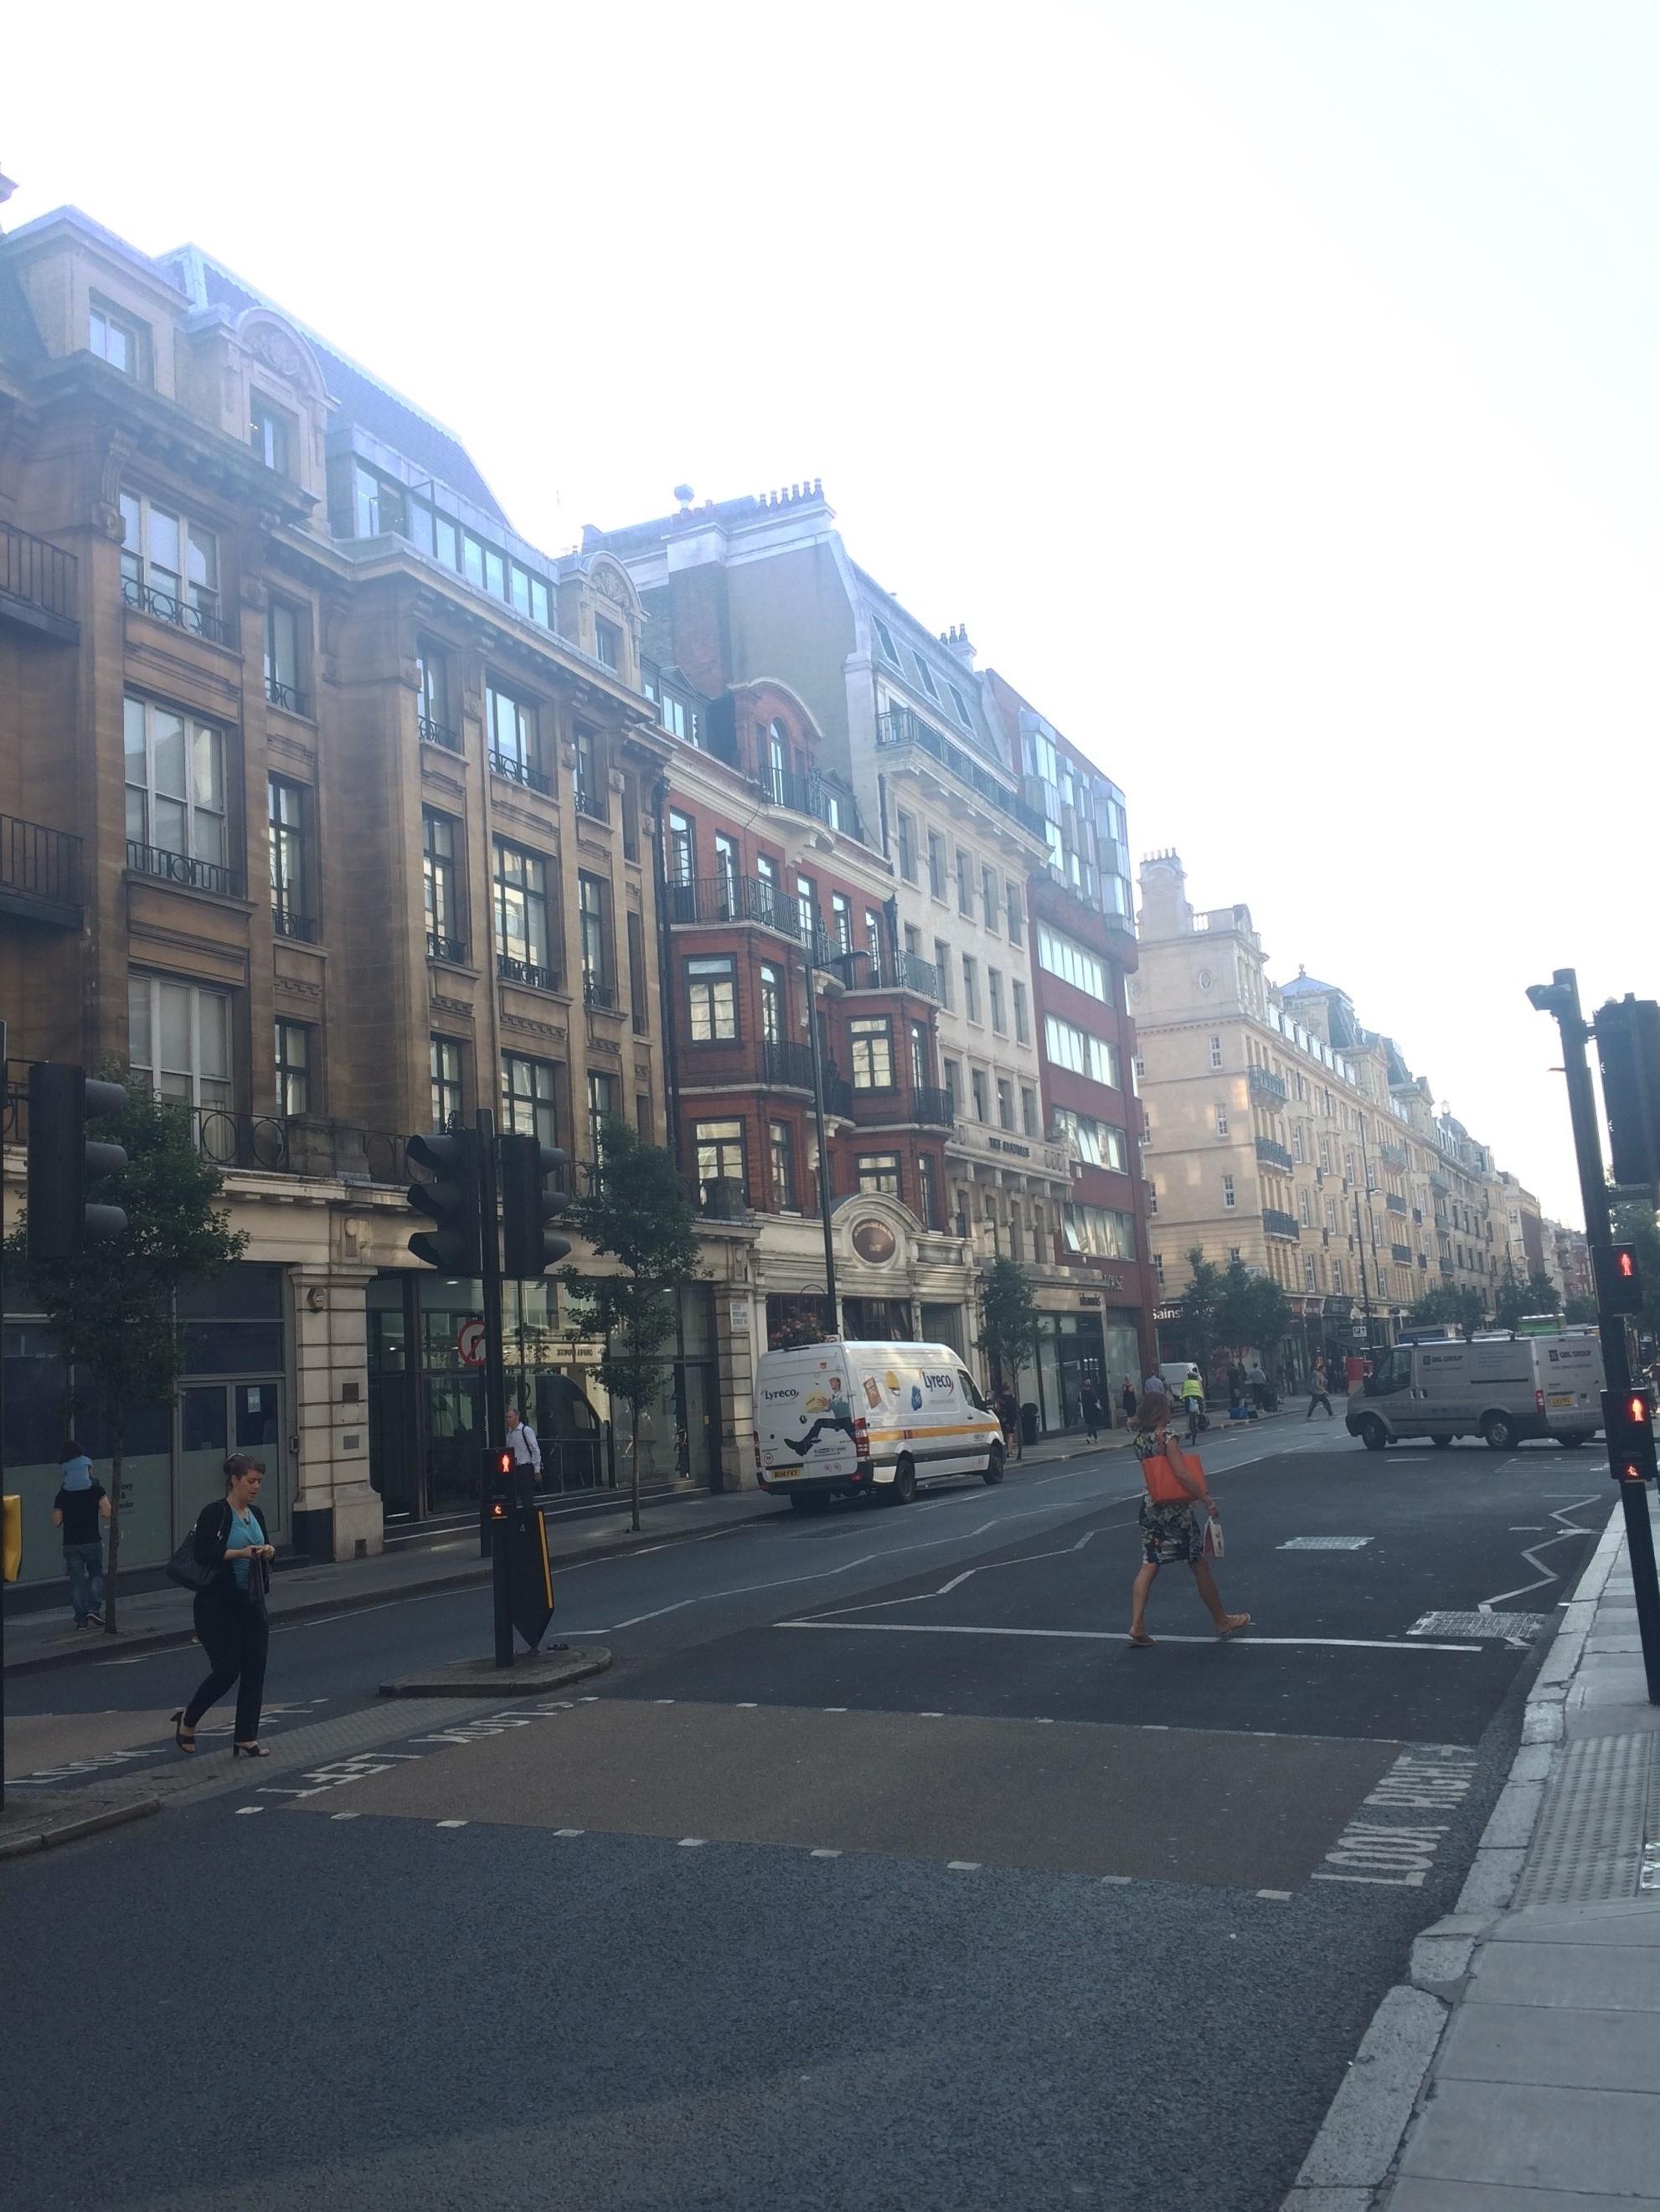 CAPAStudyAbroad_London_Fall2016_From_Katrina_Deisler_-_Internship_at_Beauty_and_the_Dirt_-_Walk_to_Work-629885-edited.jpg